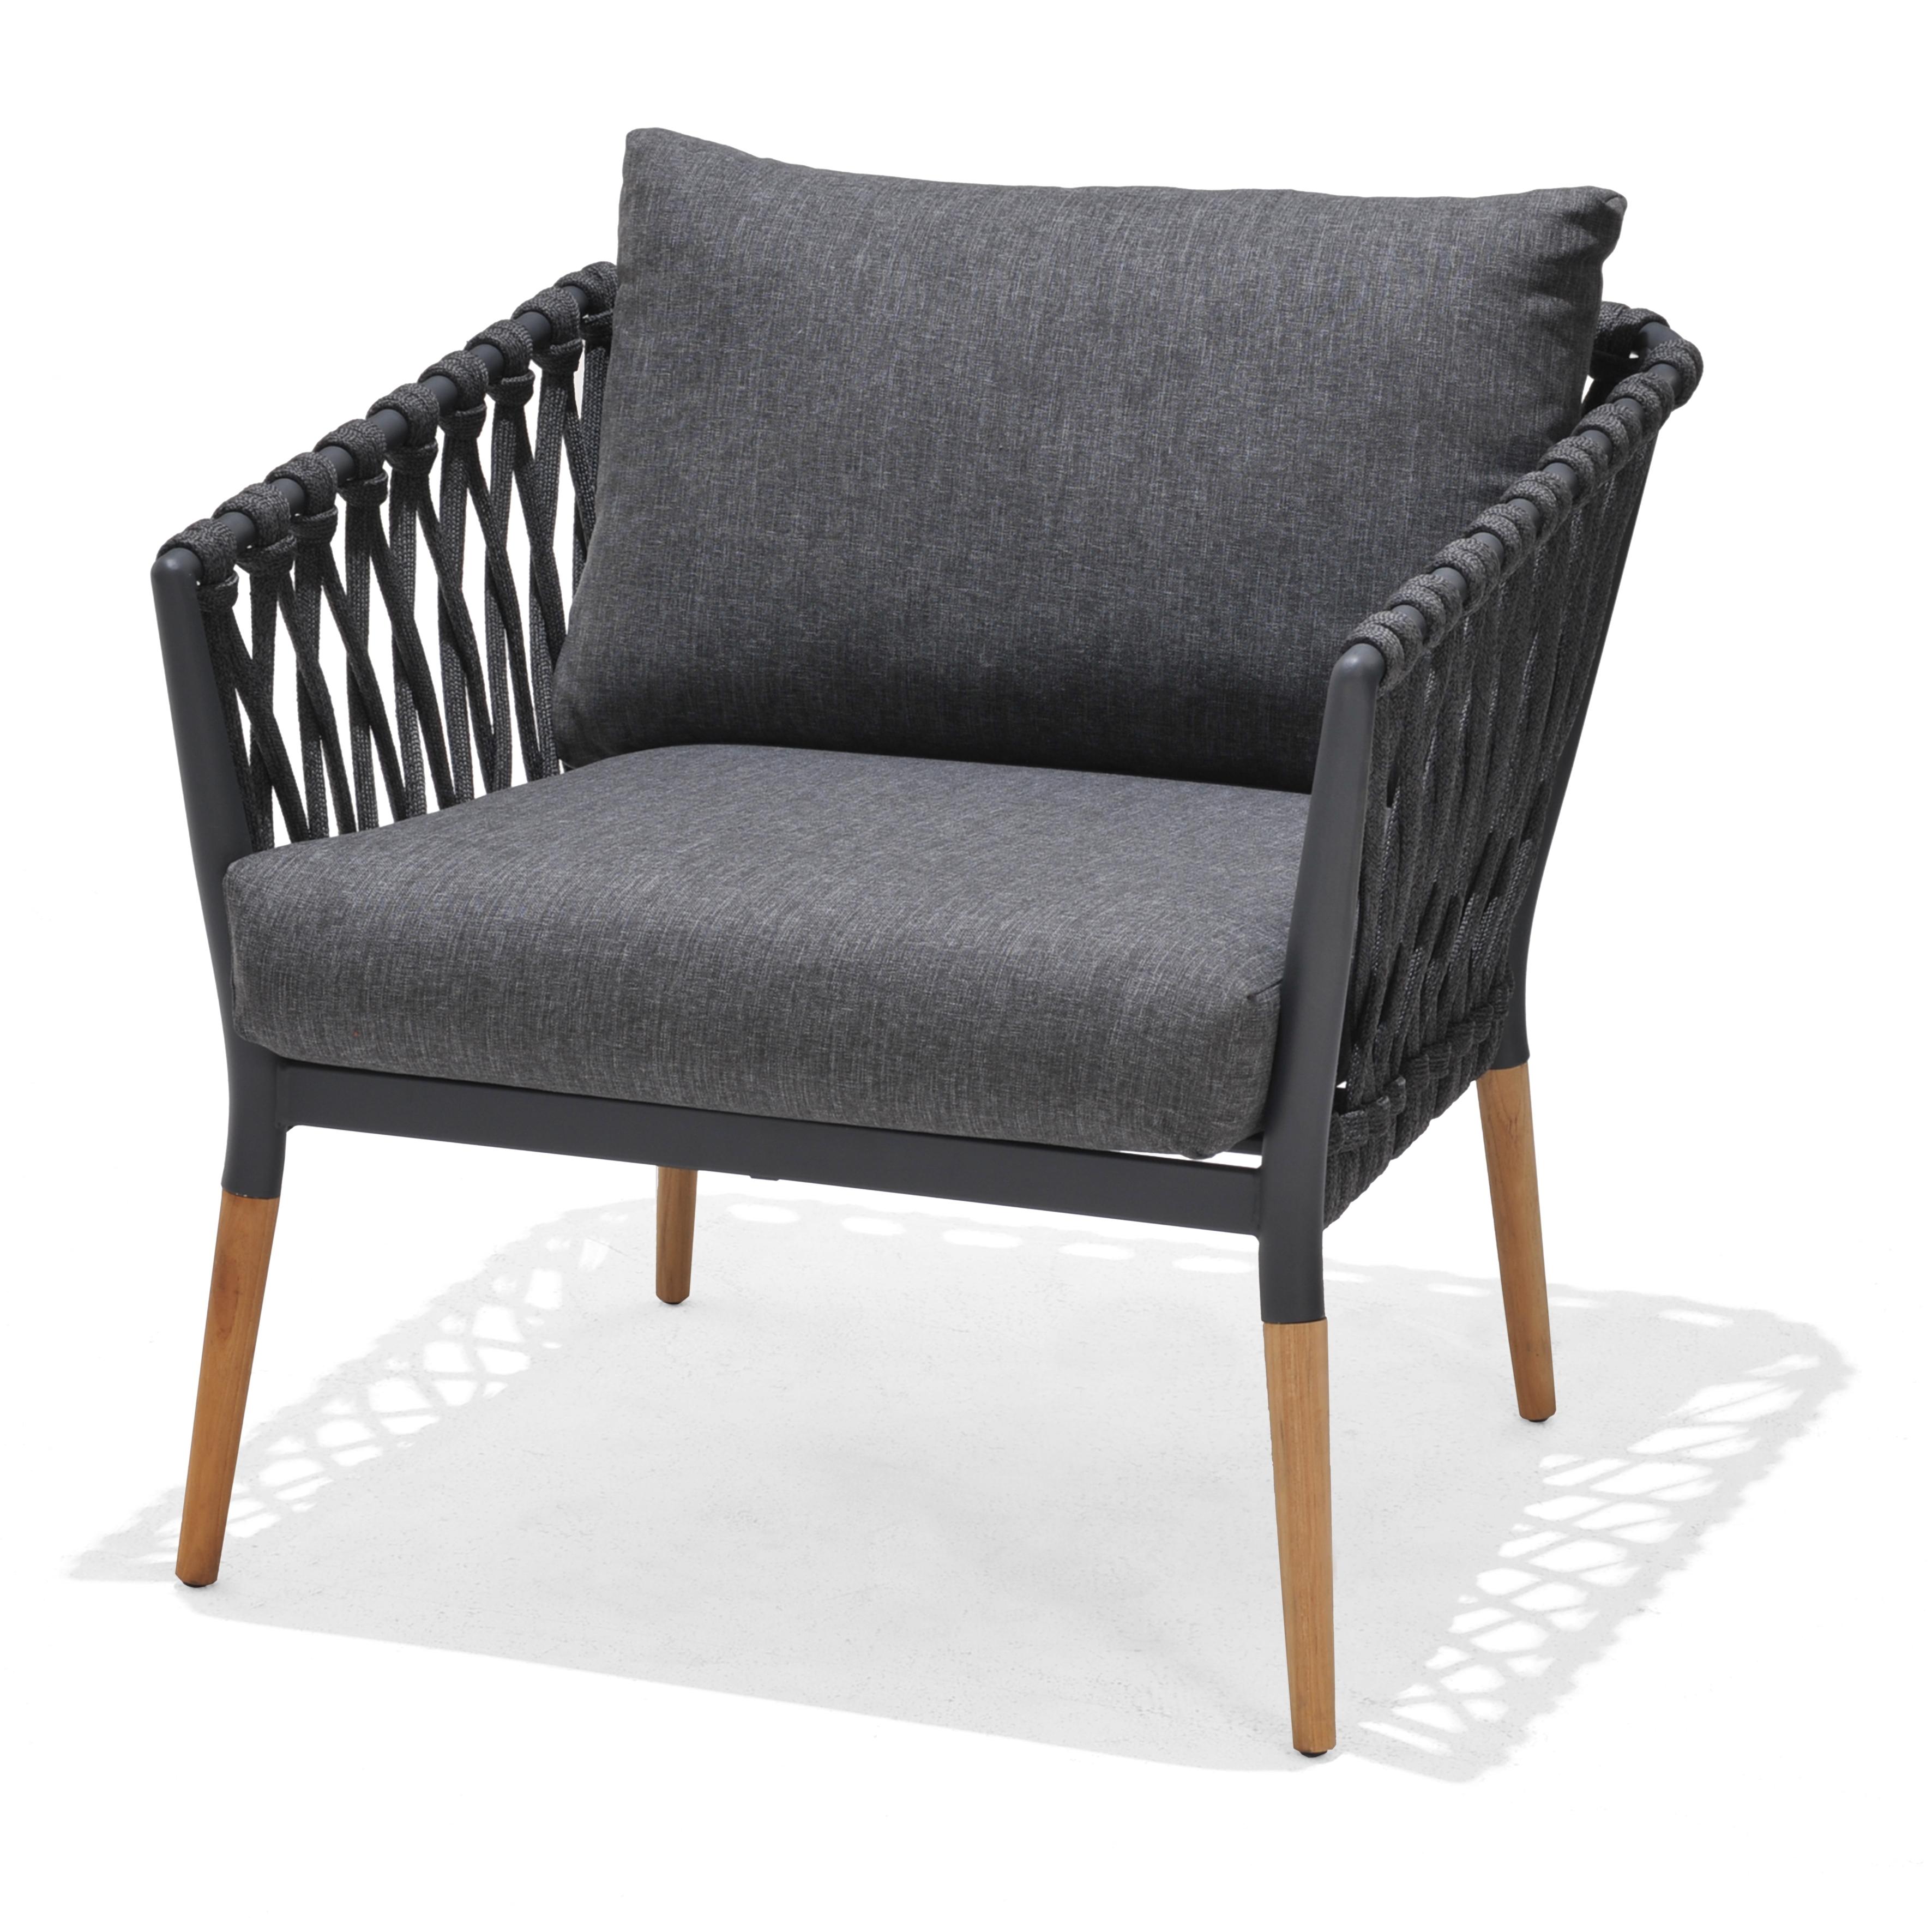 IPANEMA Sofa-Sessel